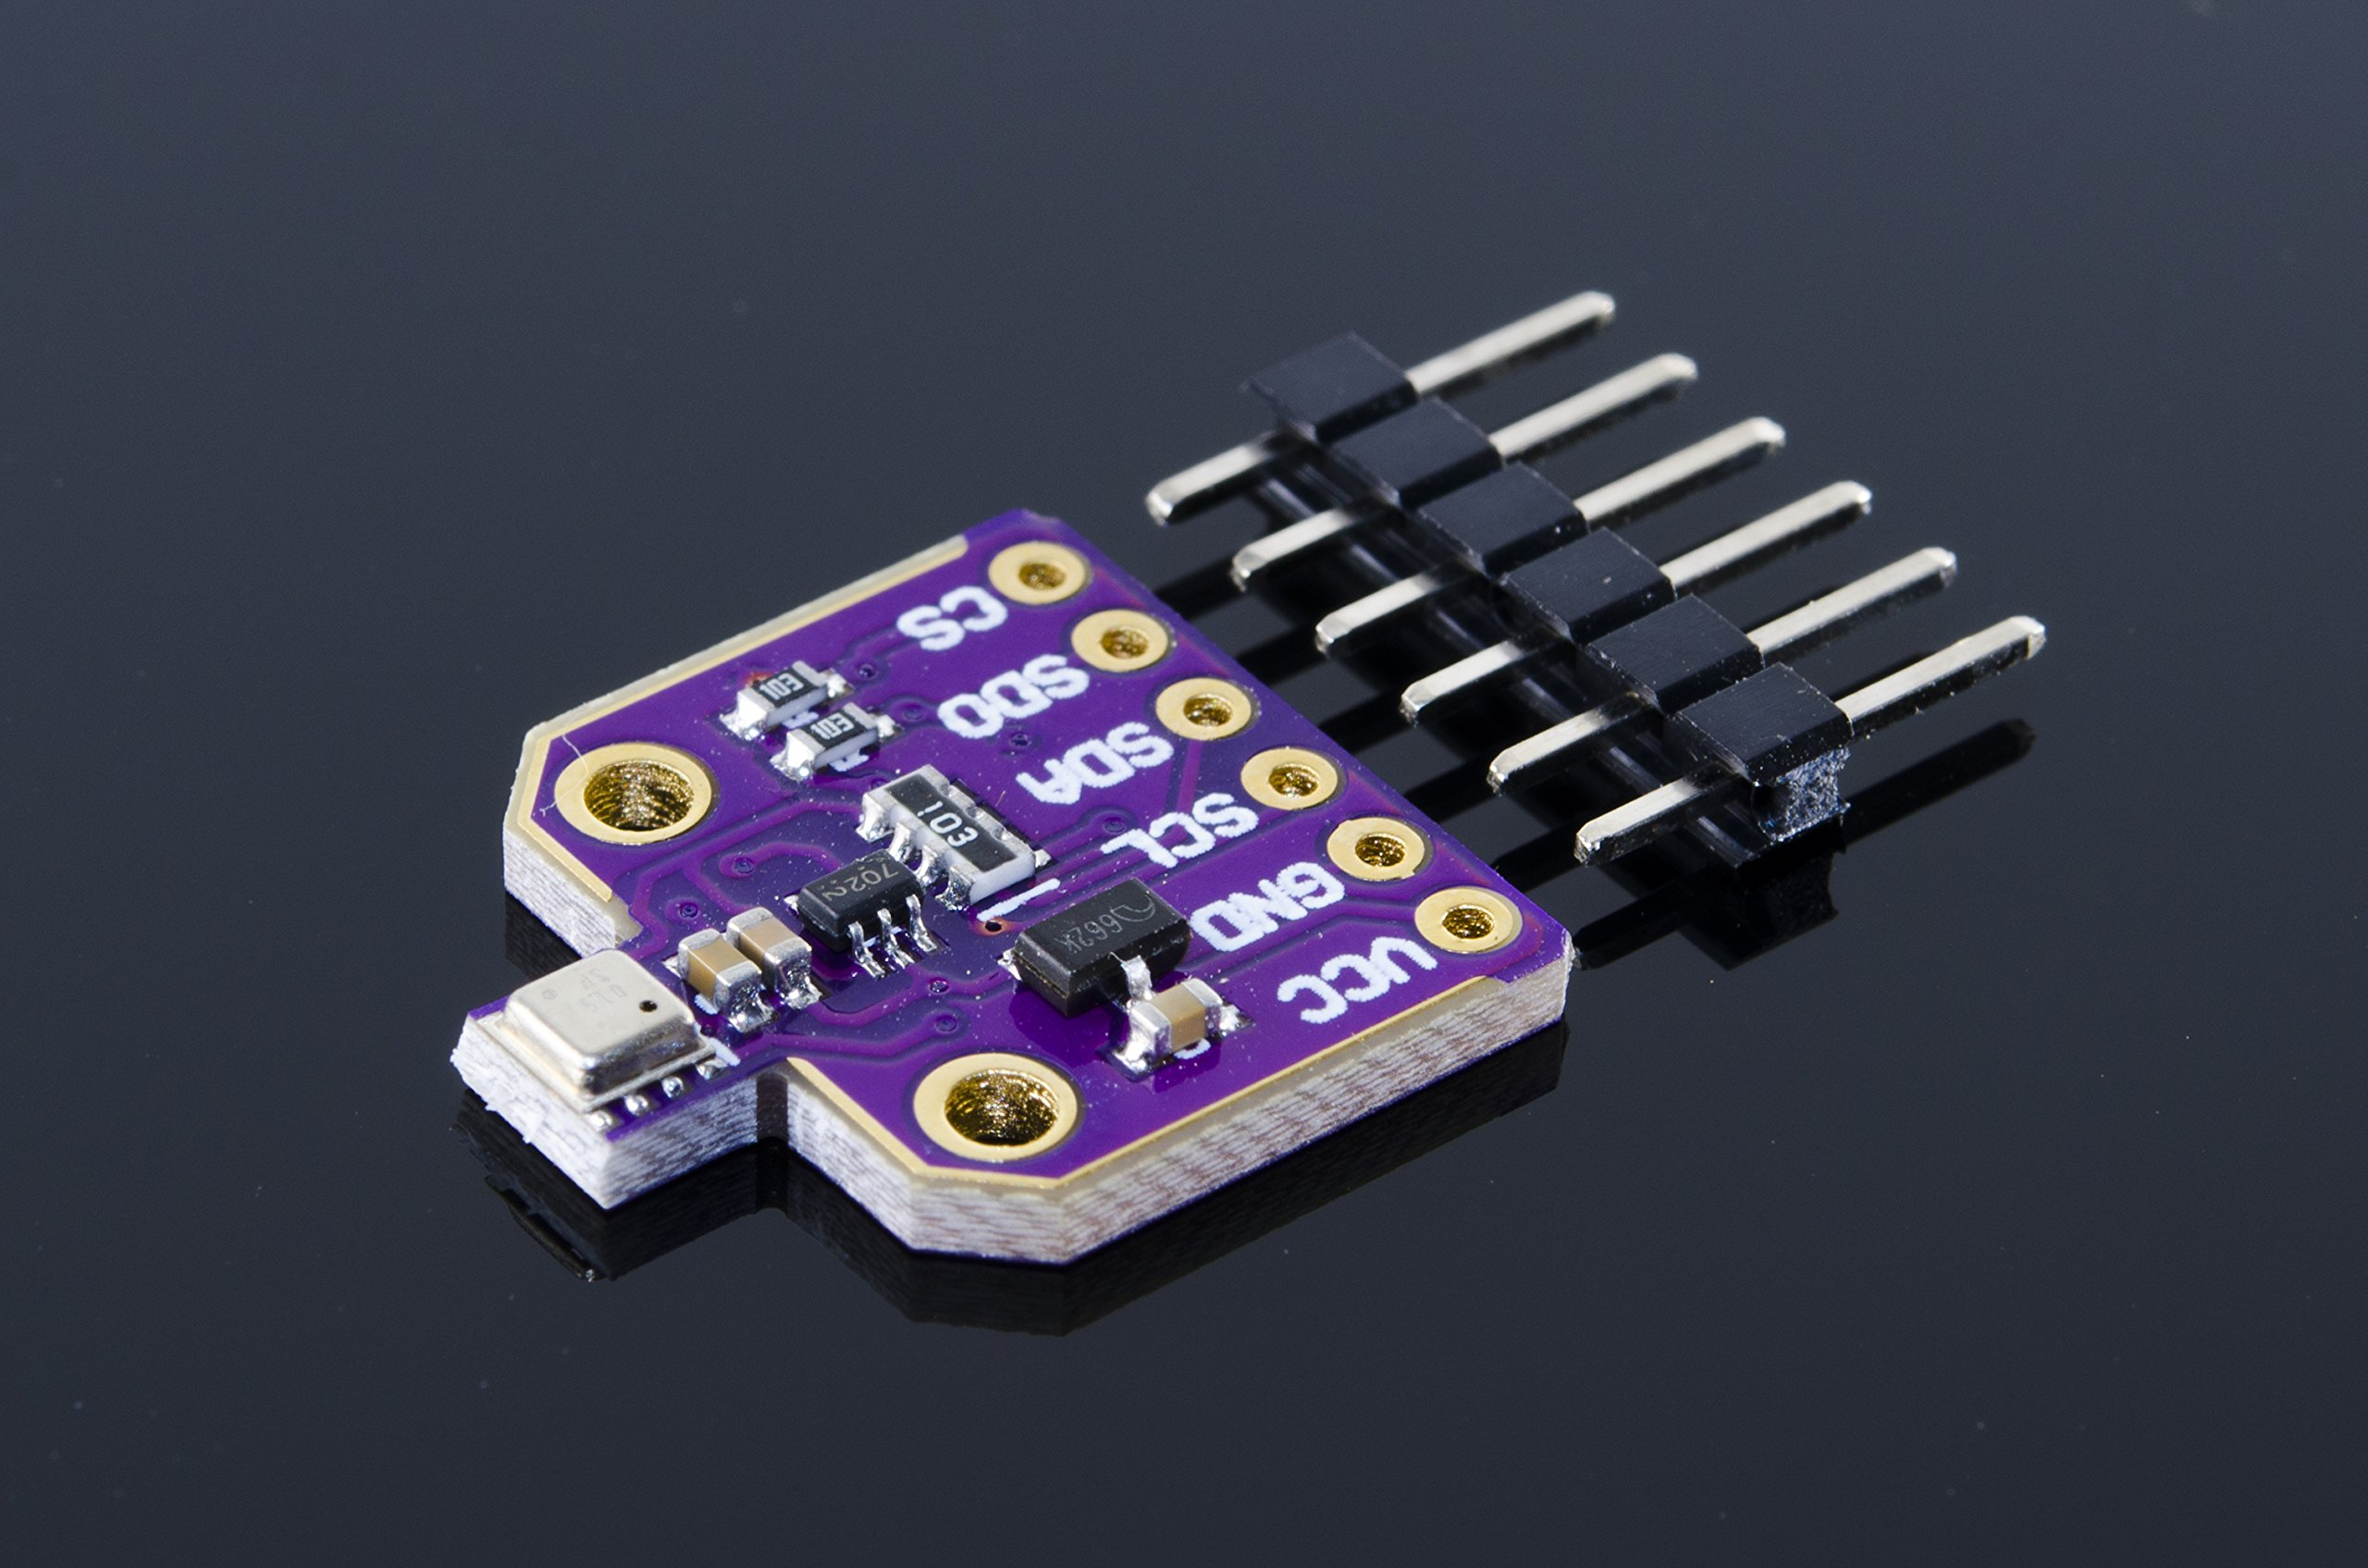 ACROBOTIC Temperature, Humidity, Pressure and Gas Sensor Breakout Board for Arduino Raspberry Pi ESP8266 BME-680 3~5VDC BME680